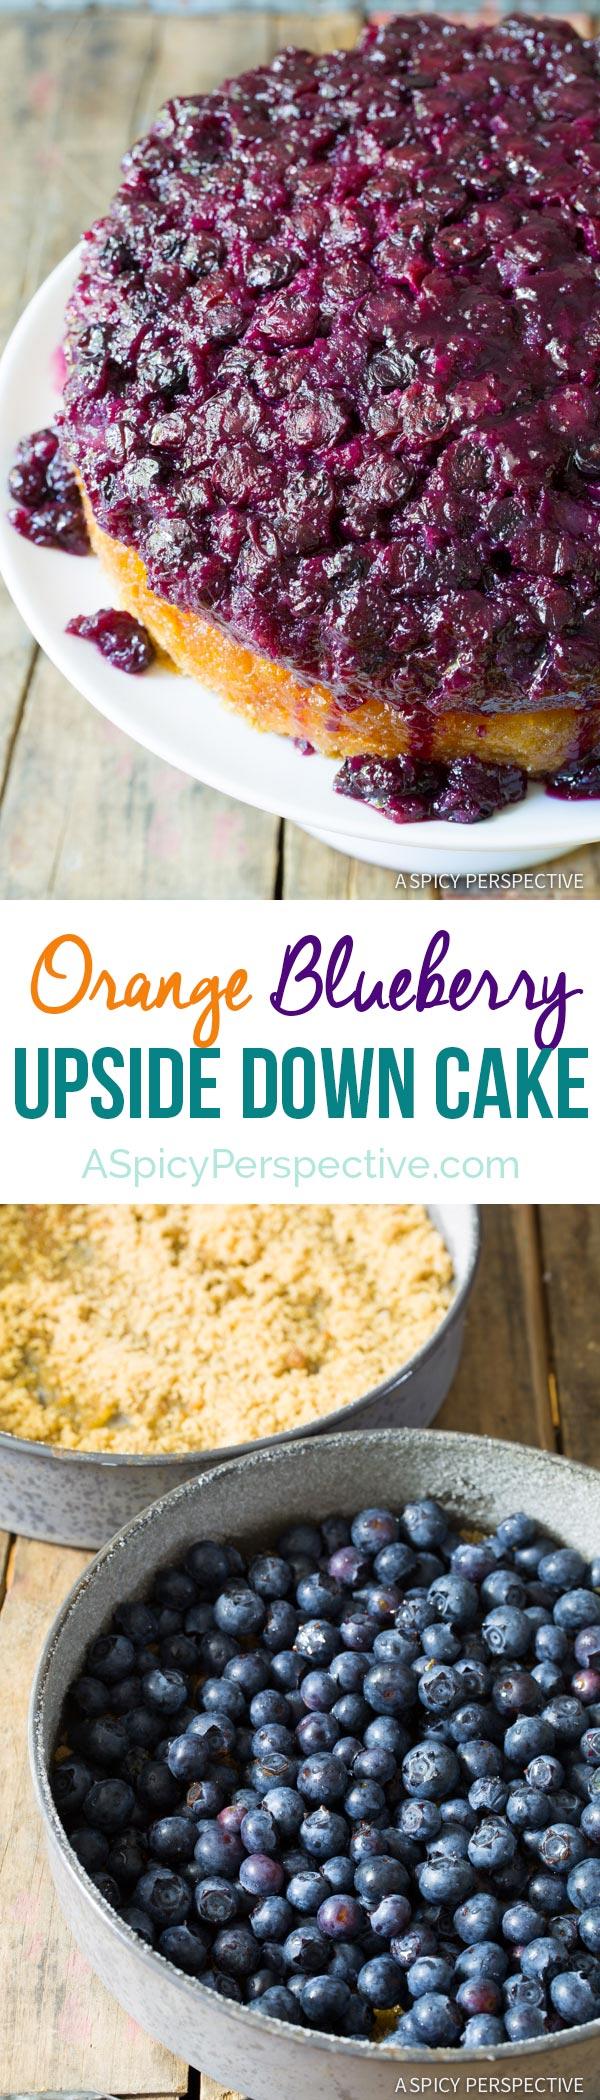 Moist and Fruity Orange Blueberry Upside Down Cake on ASpicyPerspective.com #cake